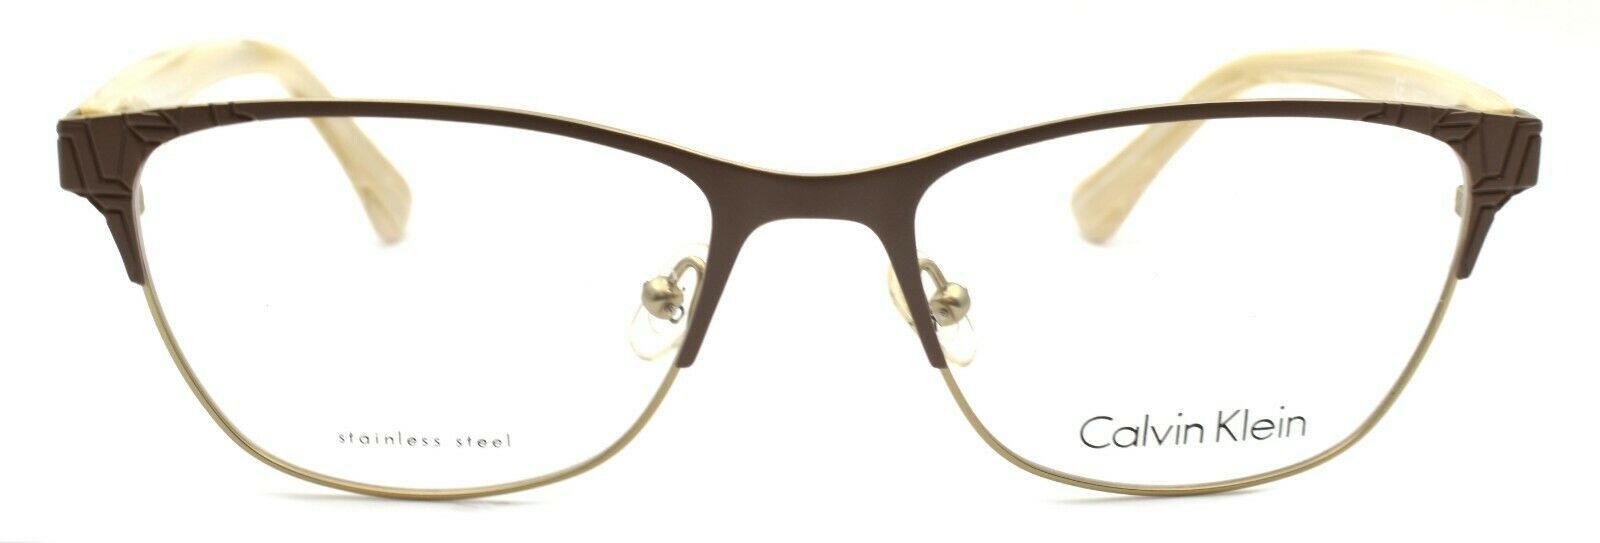 Calvin Klein CK5413 209 Women's Eyeglasses Frames 52-17-135 Beige